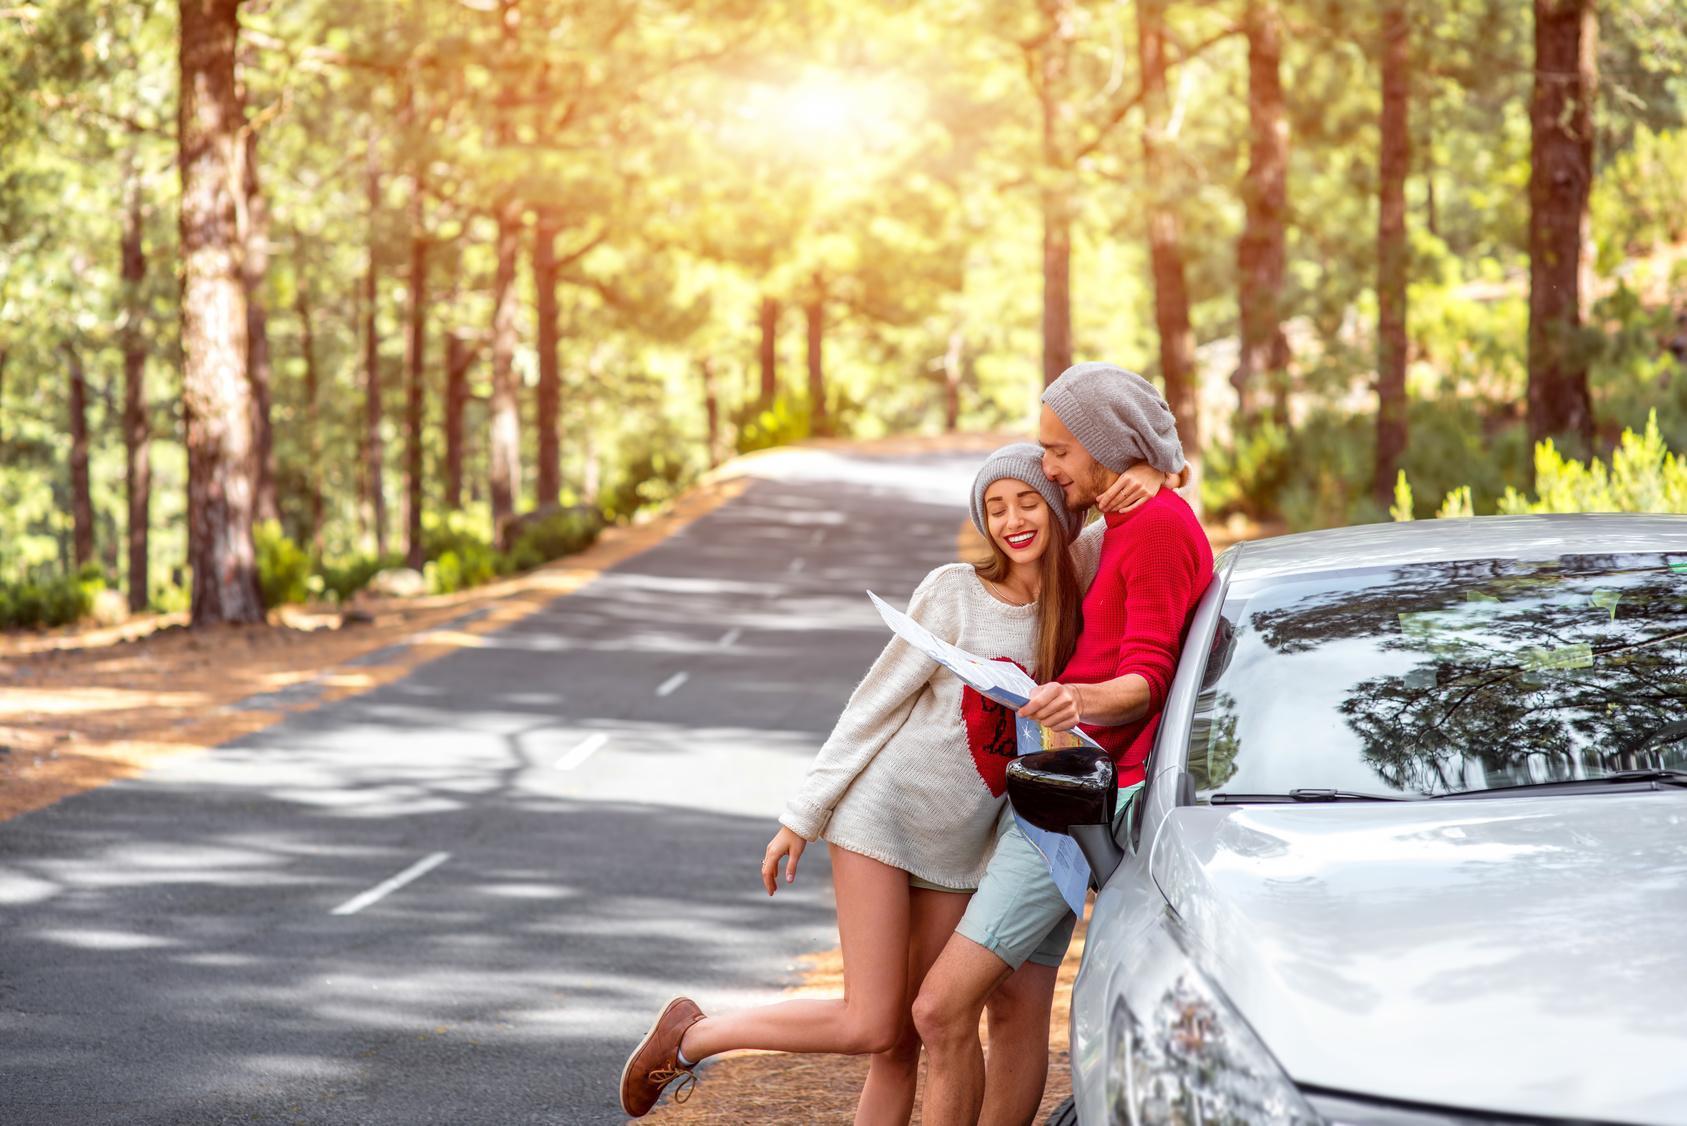 ofertas-para-aluguel-de-carros-15-03-17